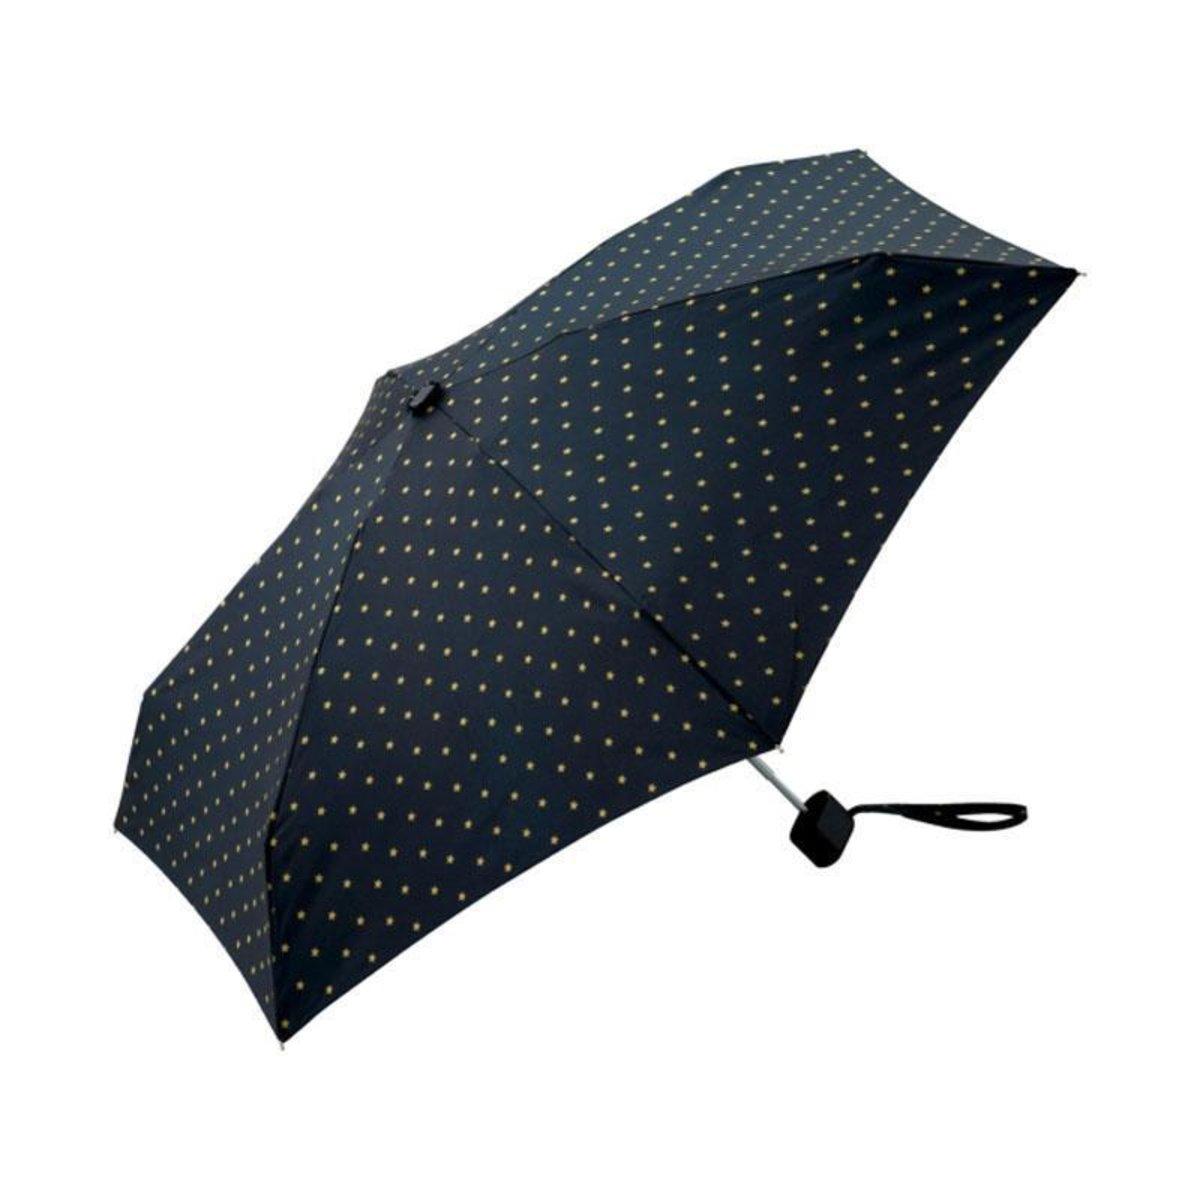 KiU Tiny 迷你縮骨遮 防UV雨傘 日本品牌 - 黑色星星 Dot Star